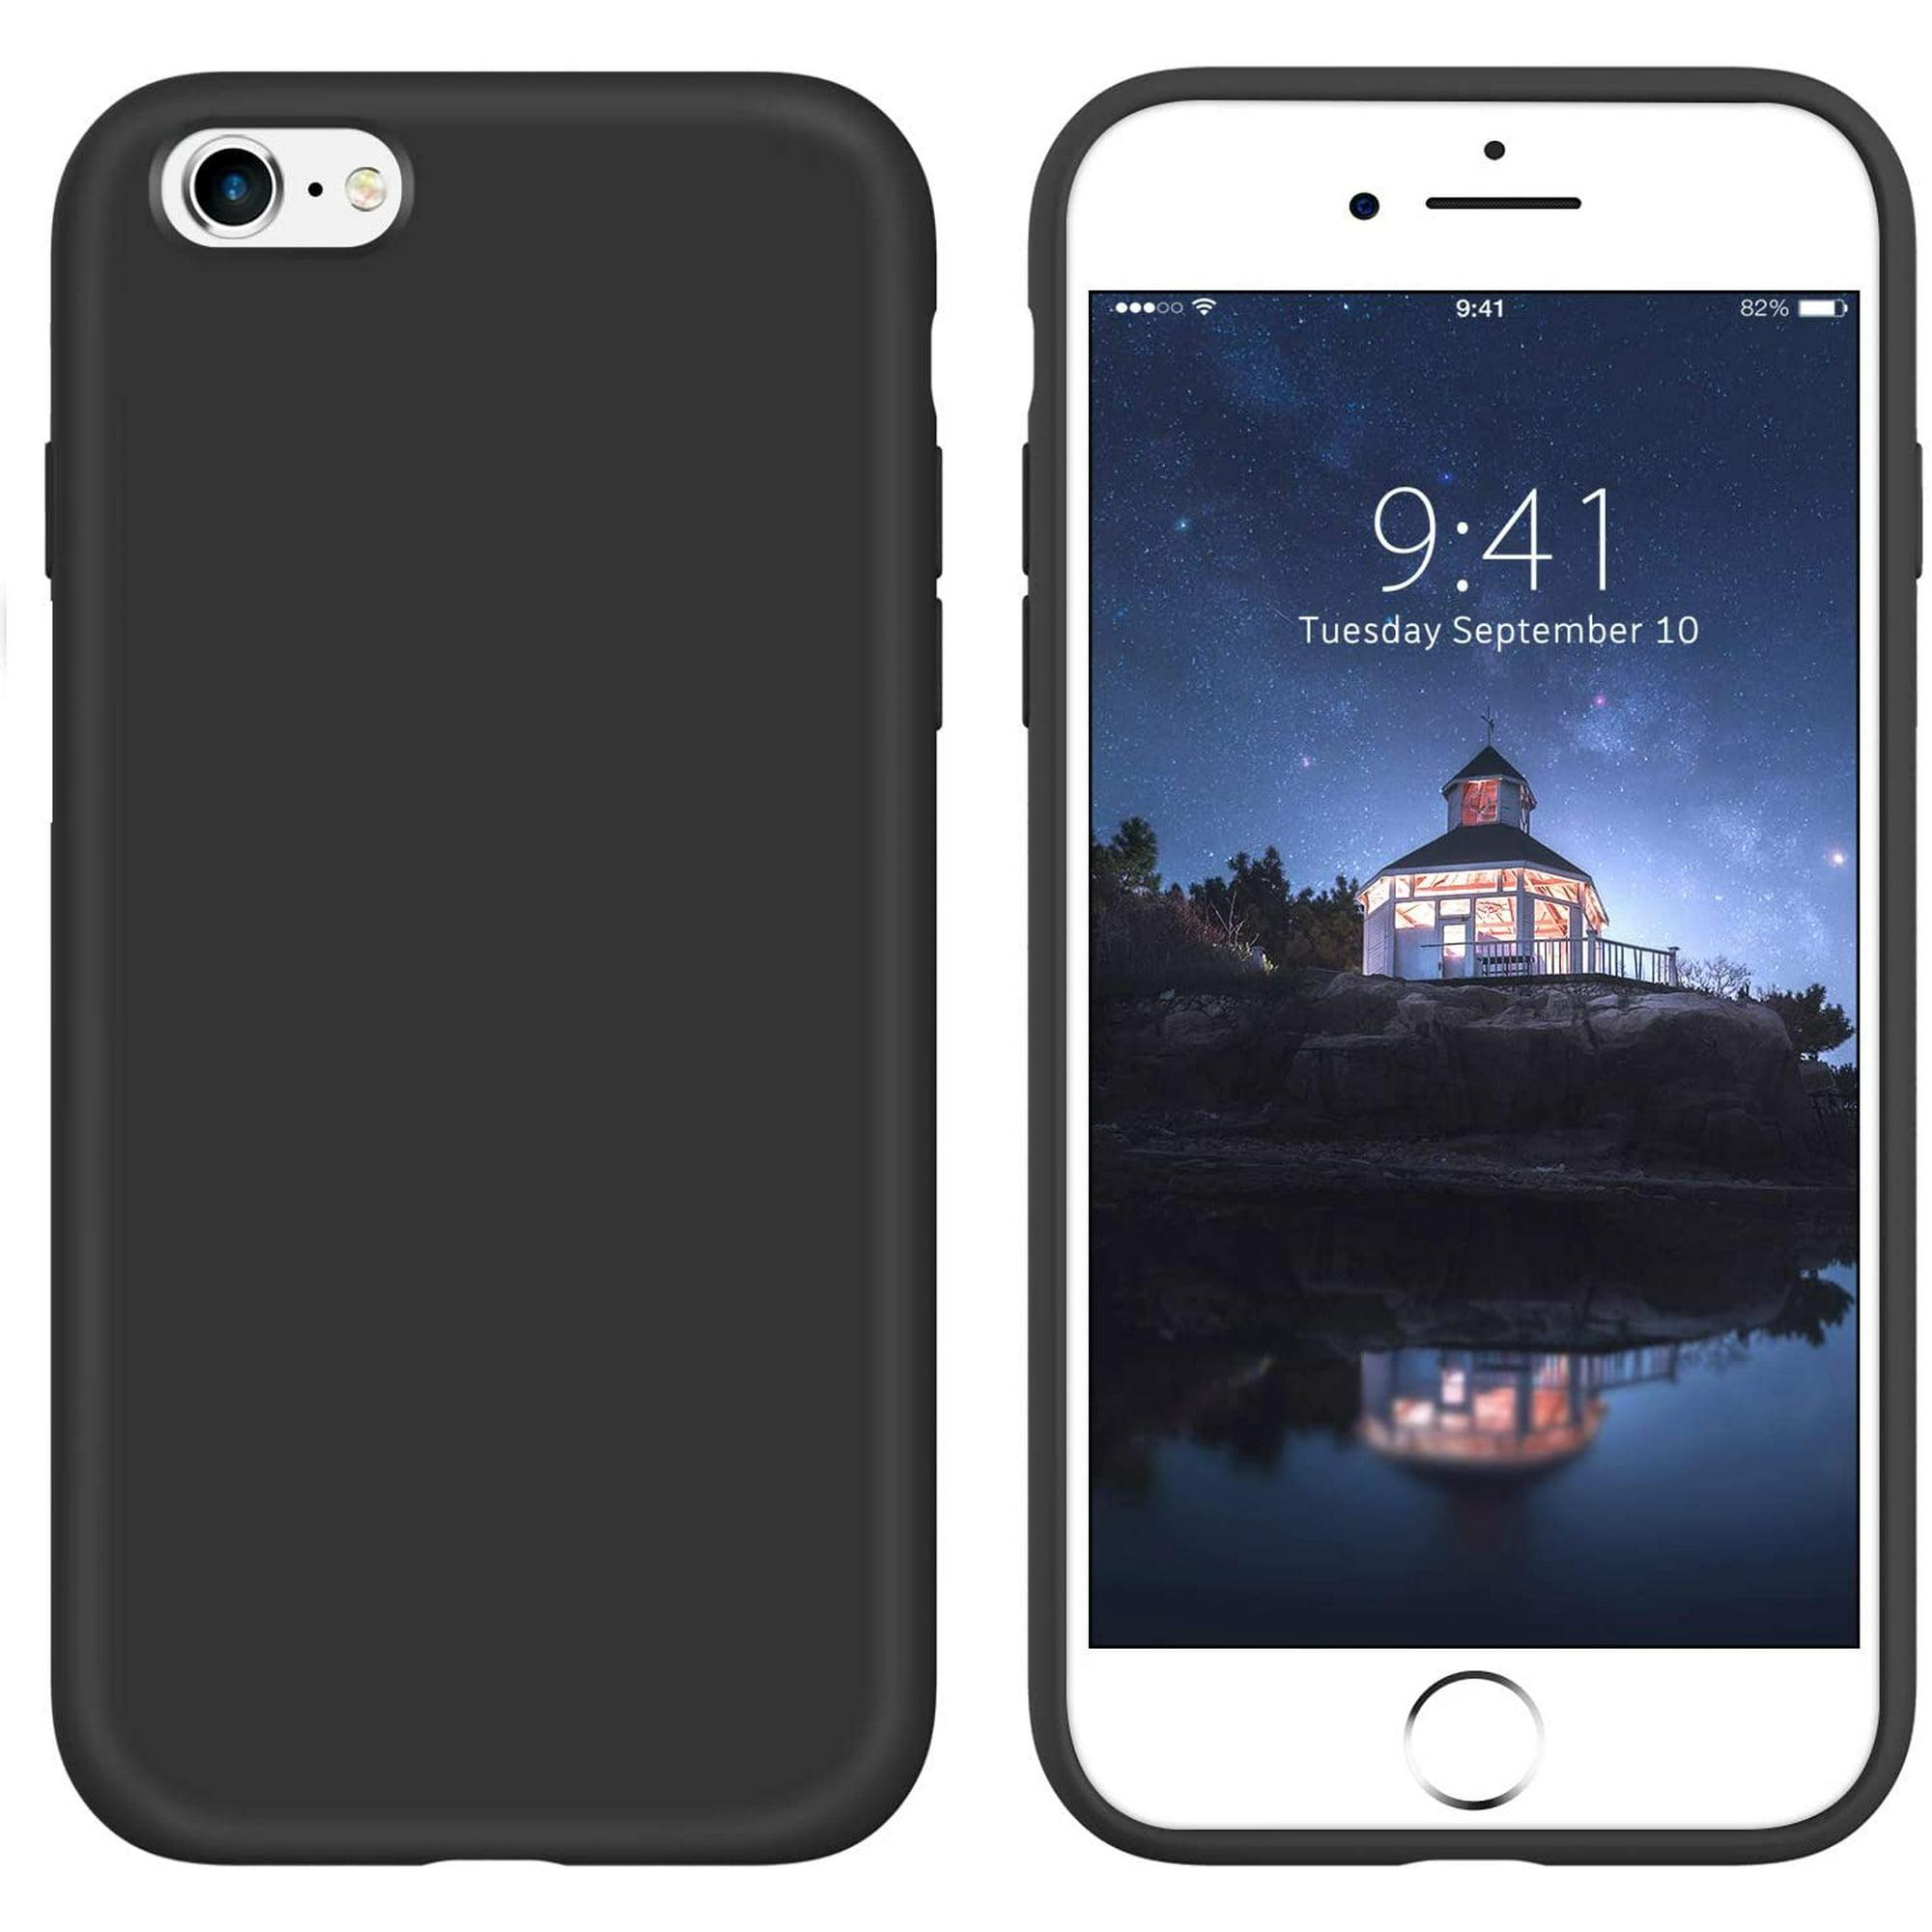 iPhone 6s Case iPhone 6 Case Liquid Silicone, GUAGUA Soft Gel Rubber Slim Lightweight Microfiber Lining Cushion Texture